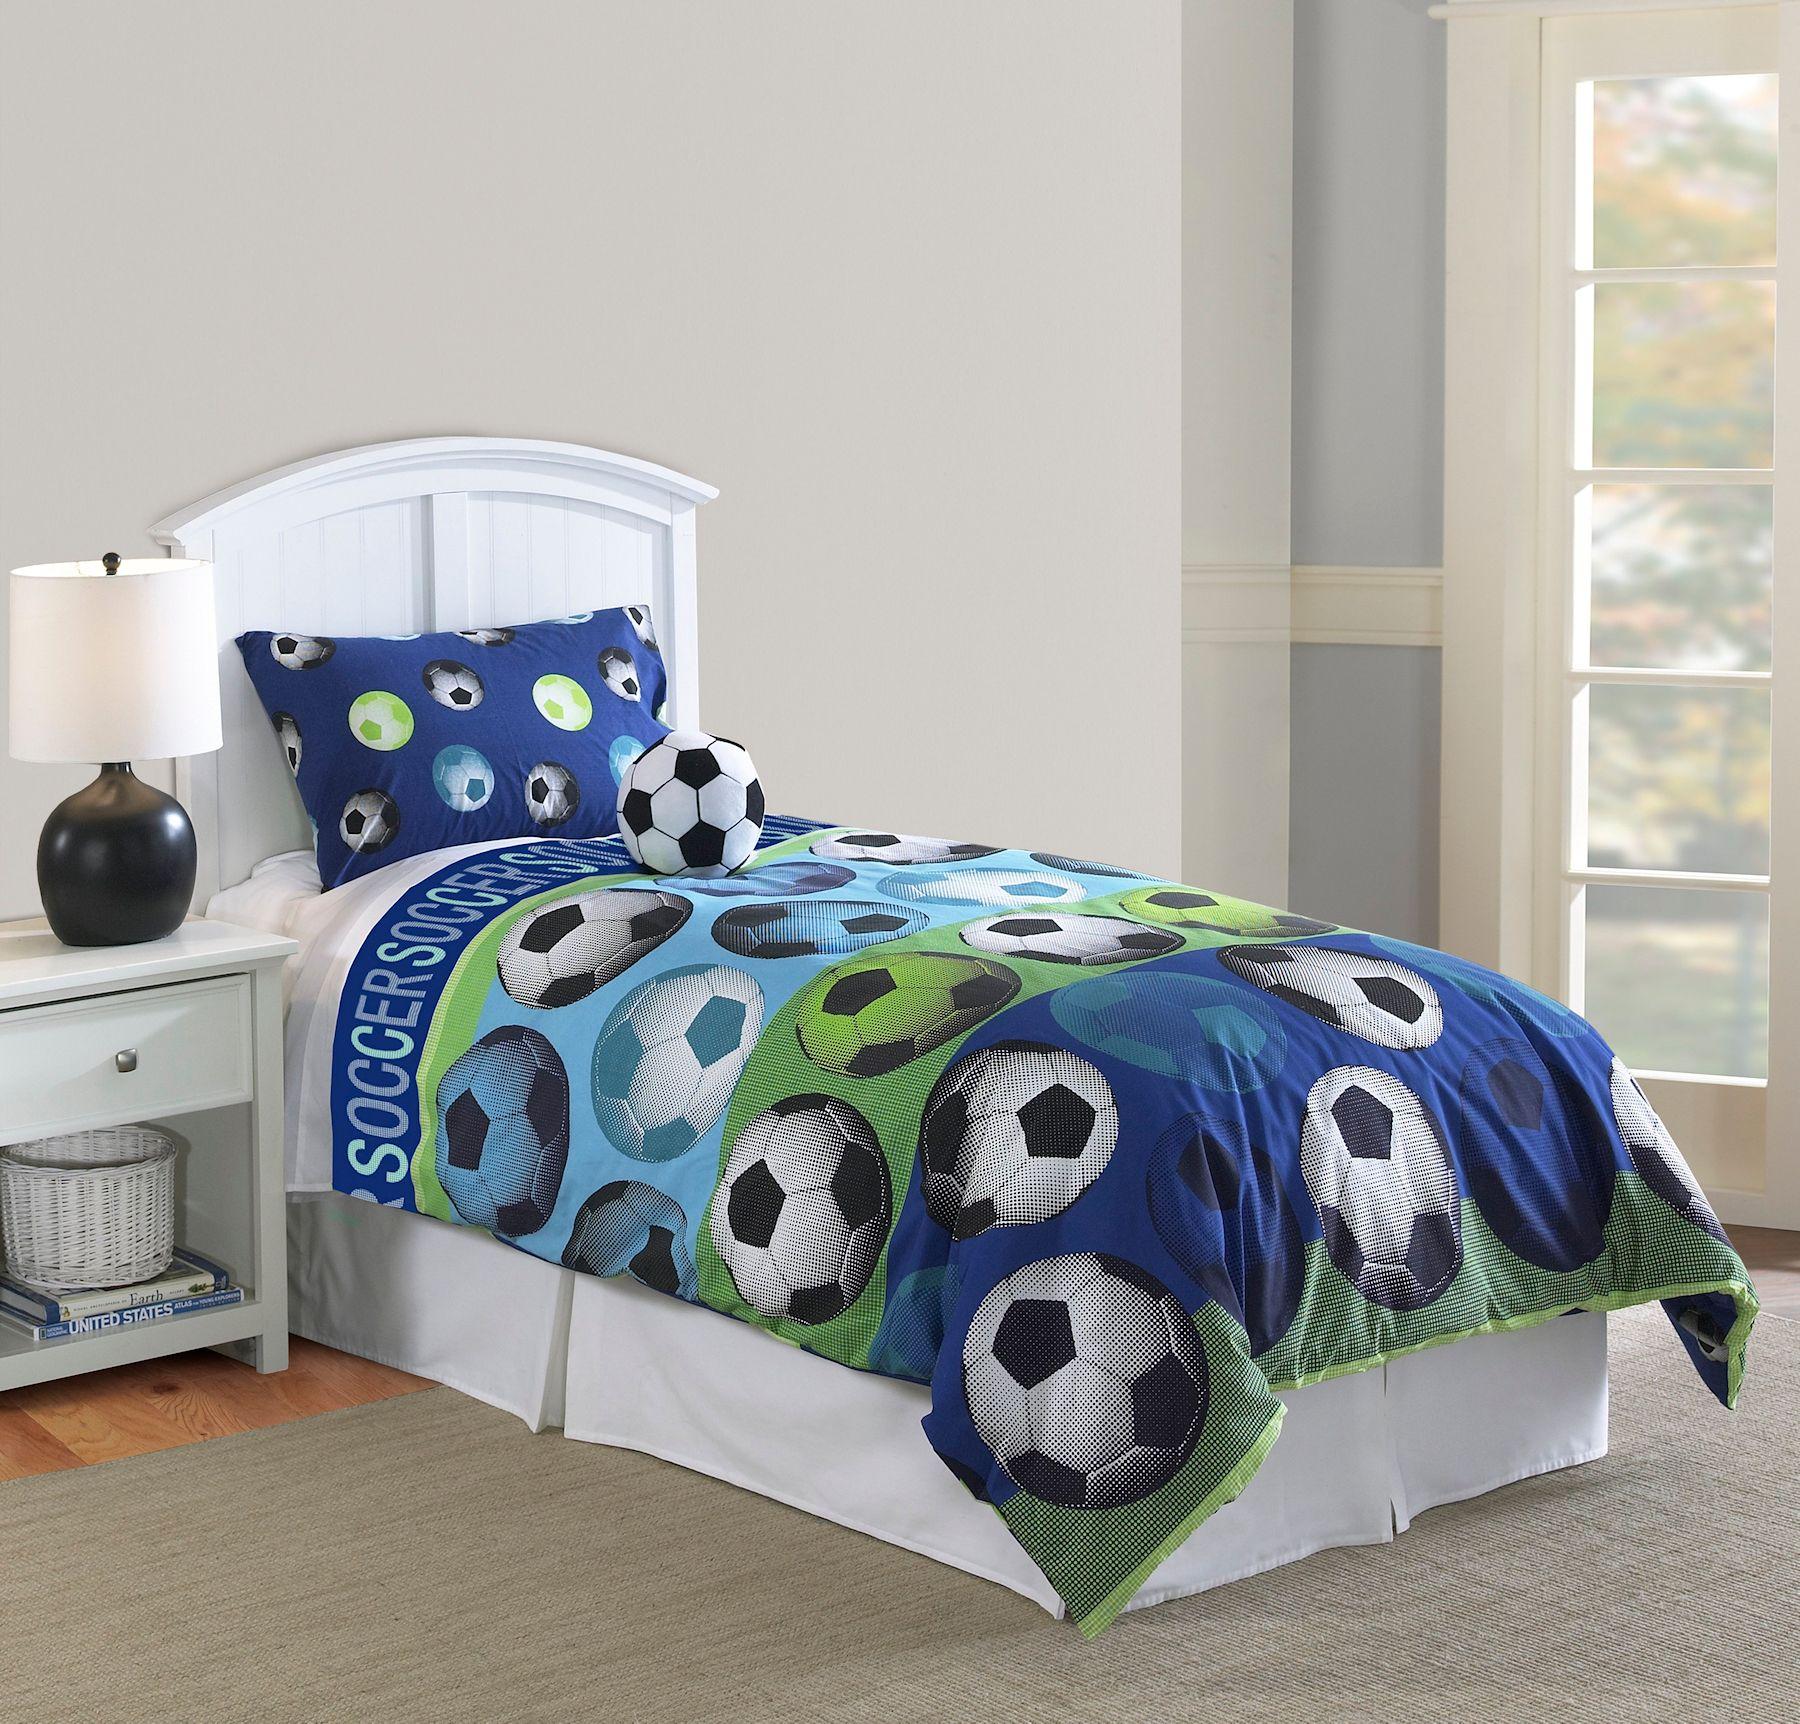 Boys soccer bedroom ideas - Blue Green Soccer Ball Bedding Twin Full Queen Comforter Set With